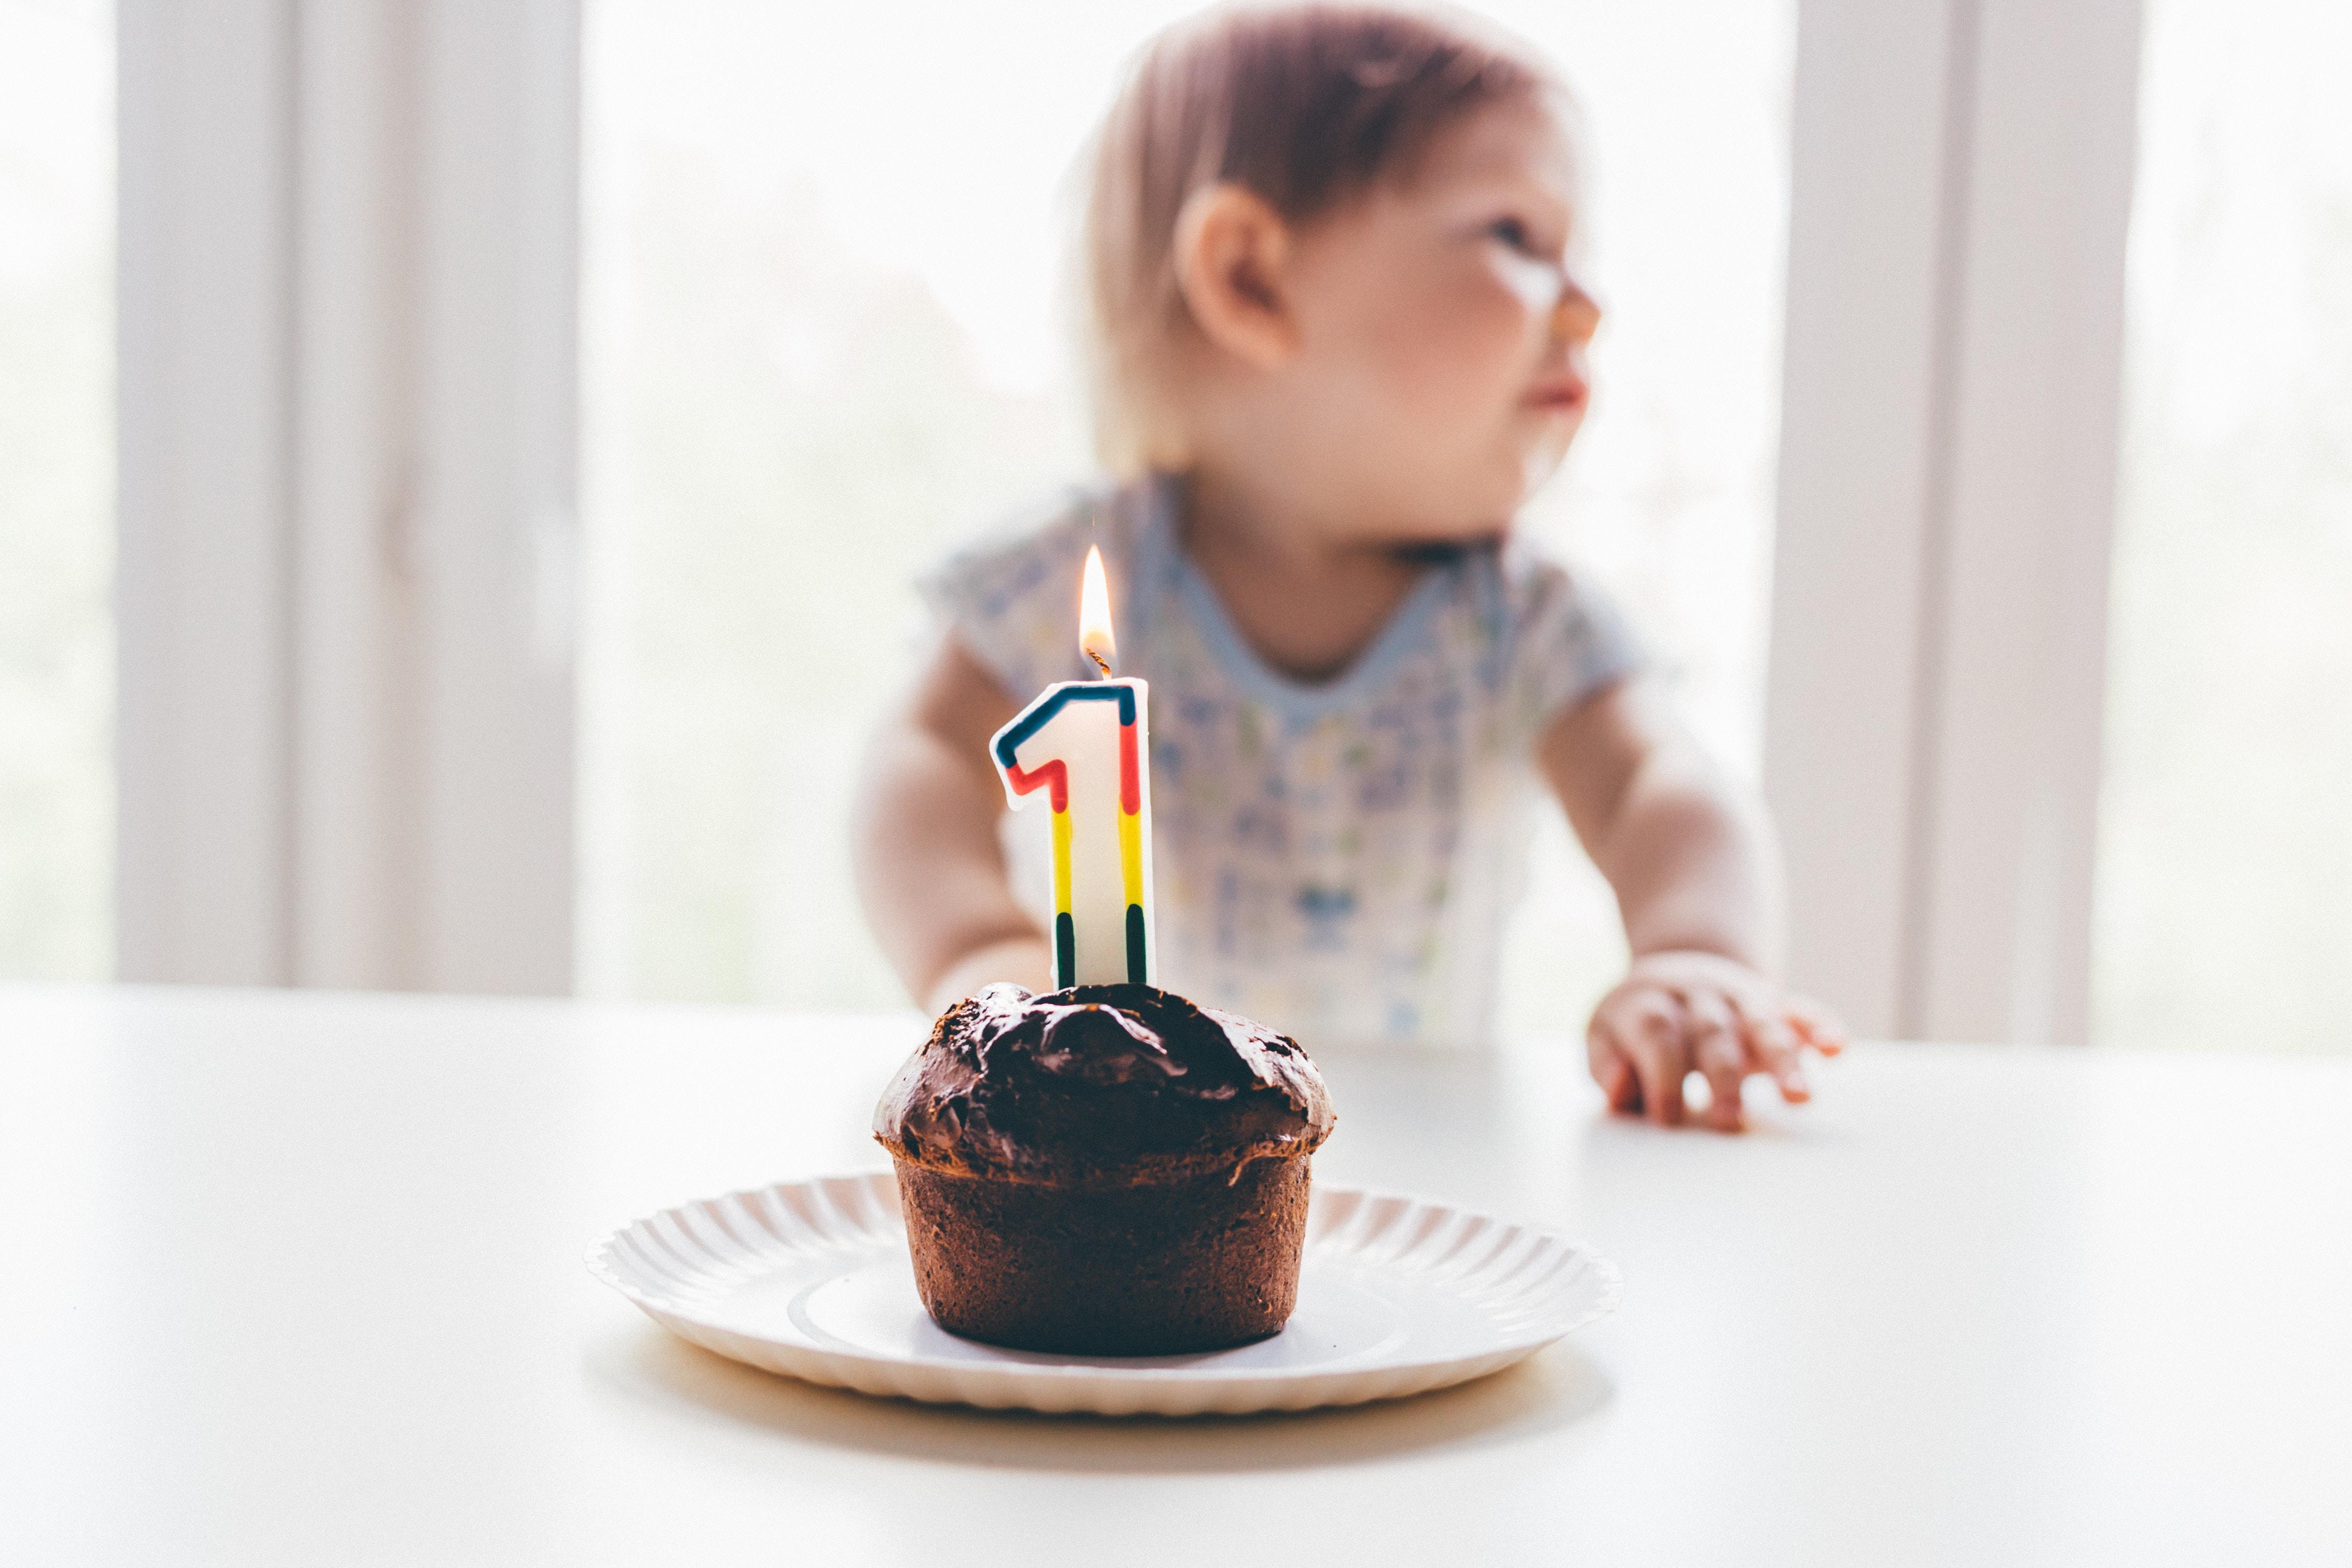 O 1º ano do bebê